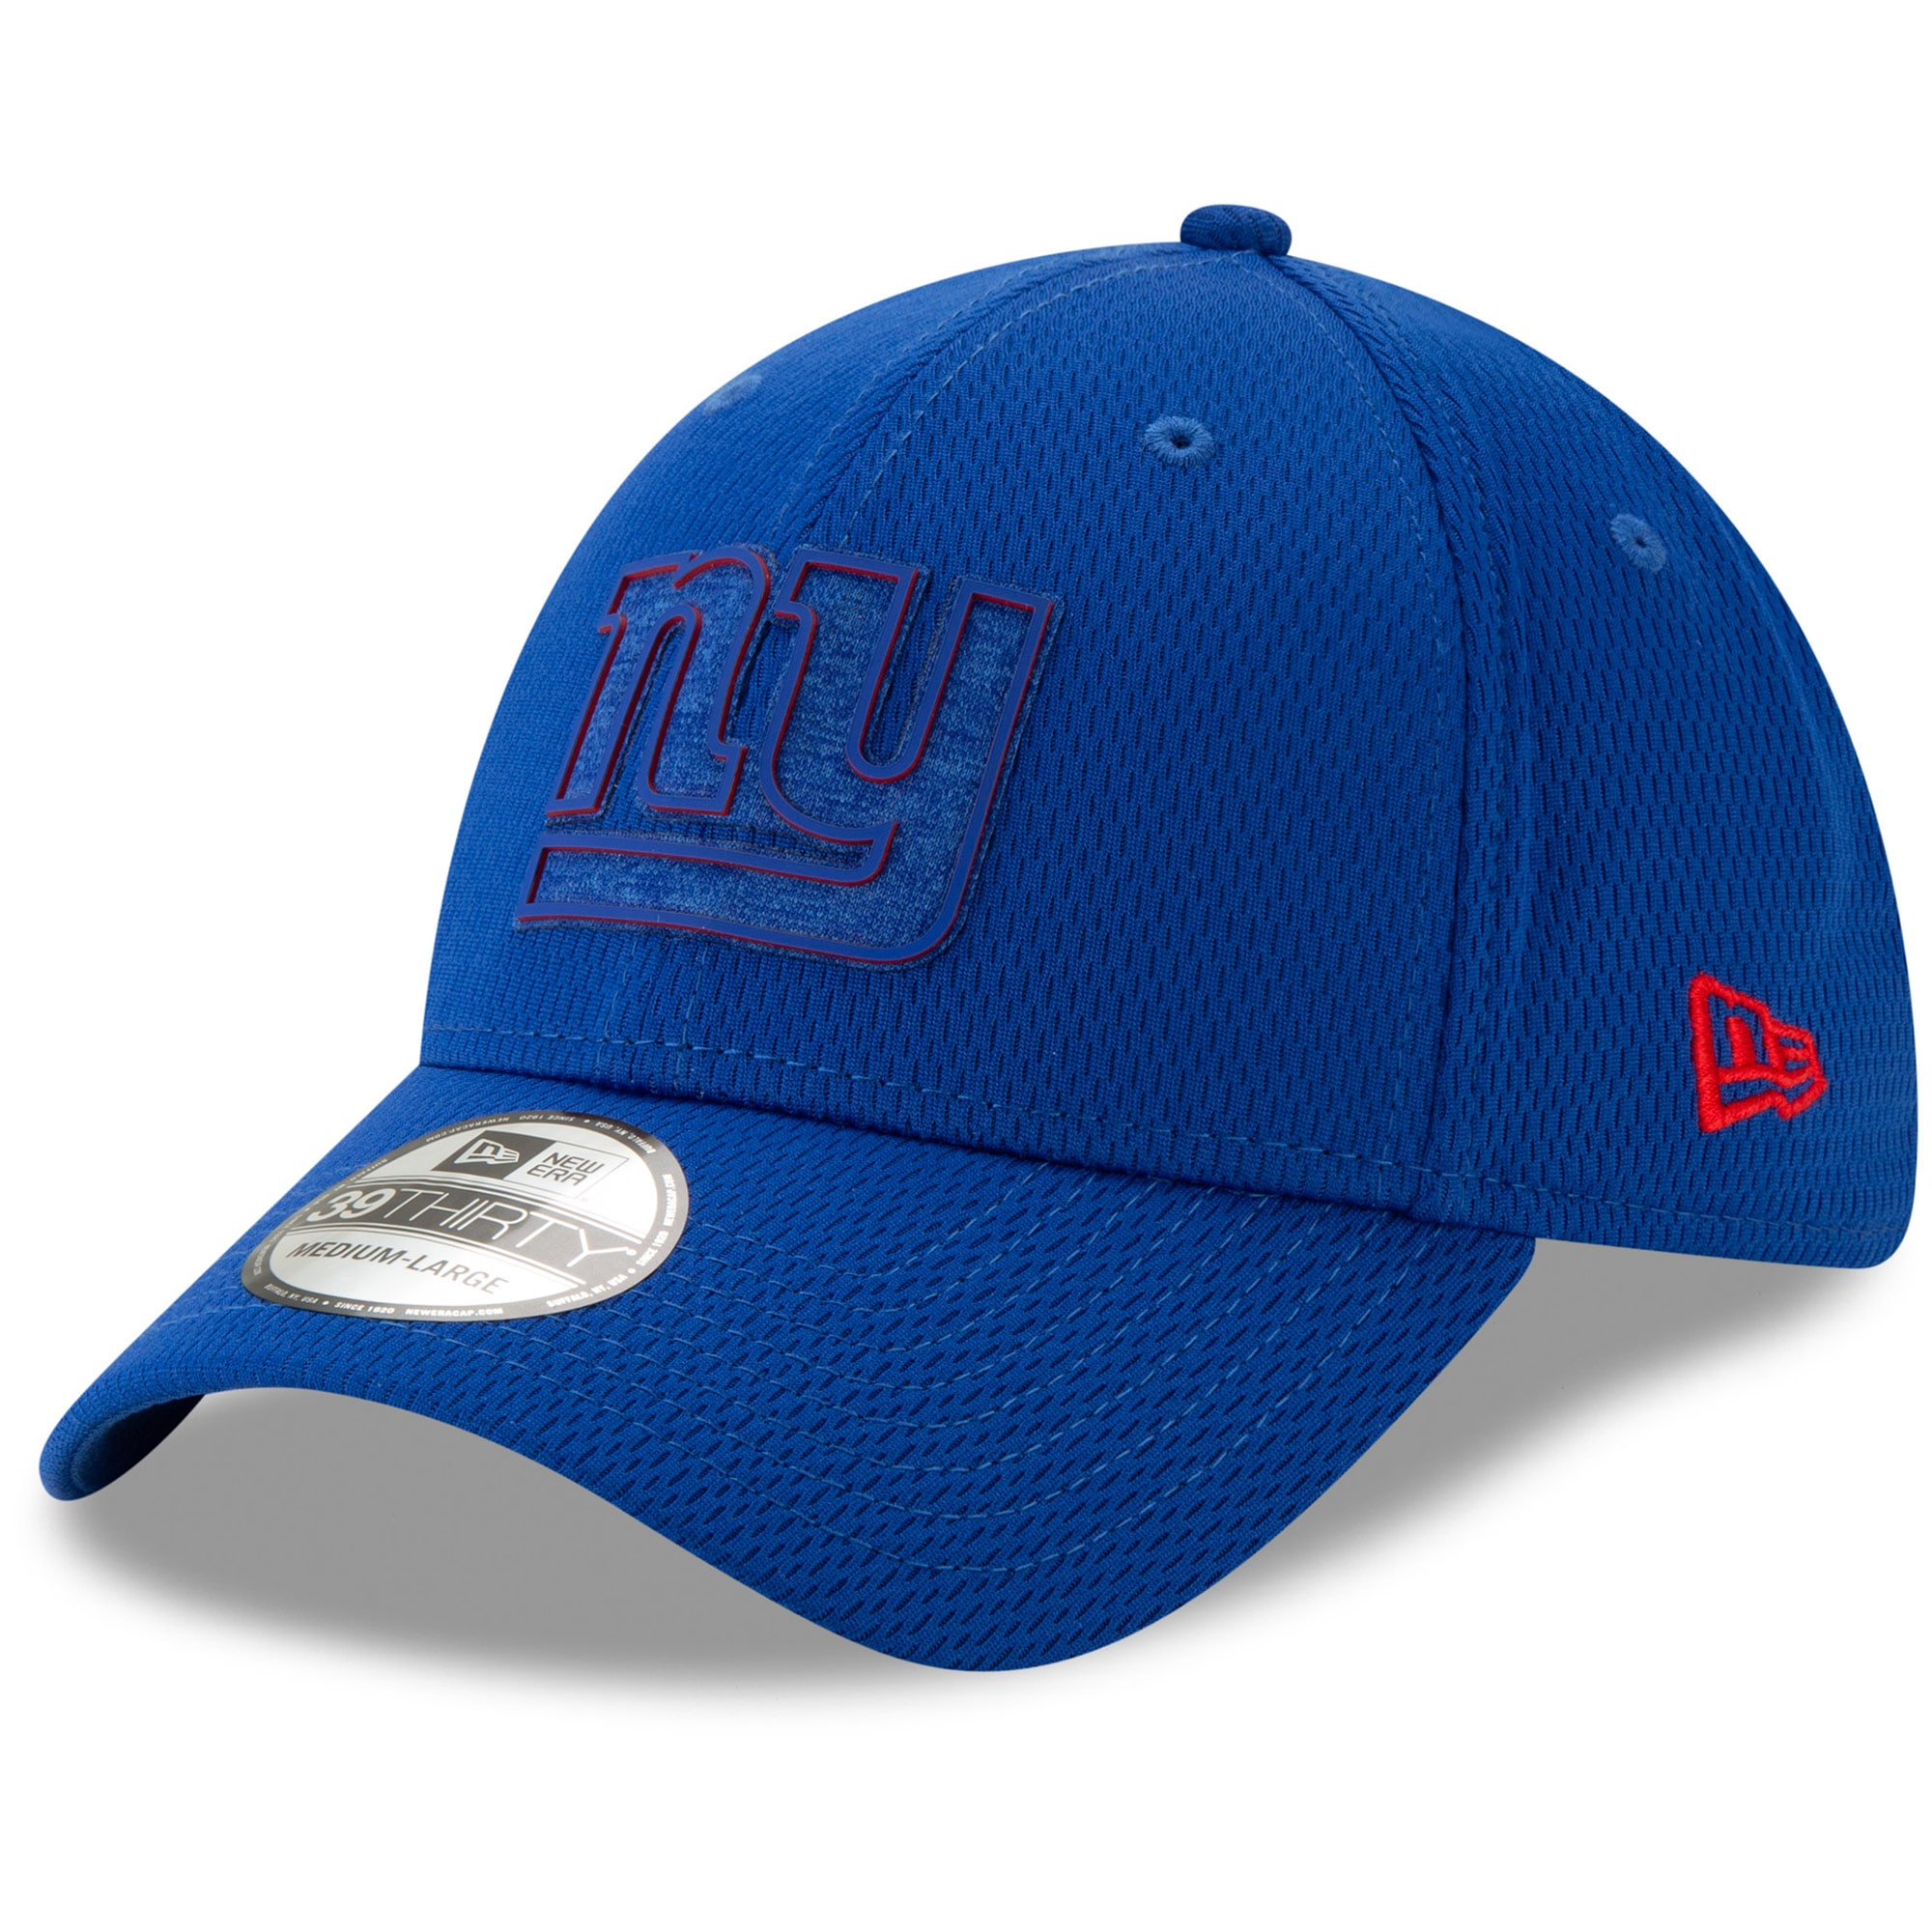 New York Giants New Era Mold 39THIRTY Flex Hat - Royal